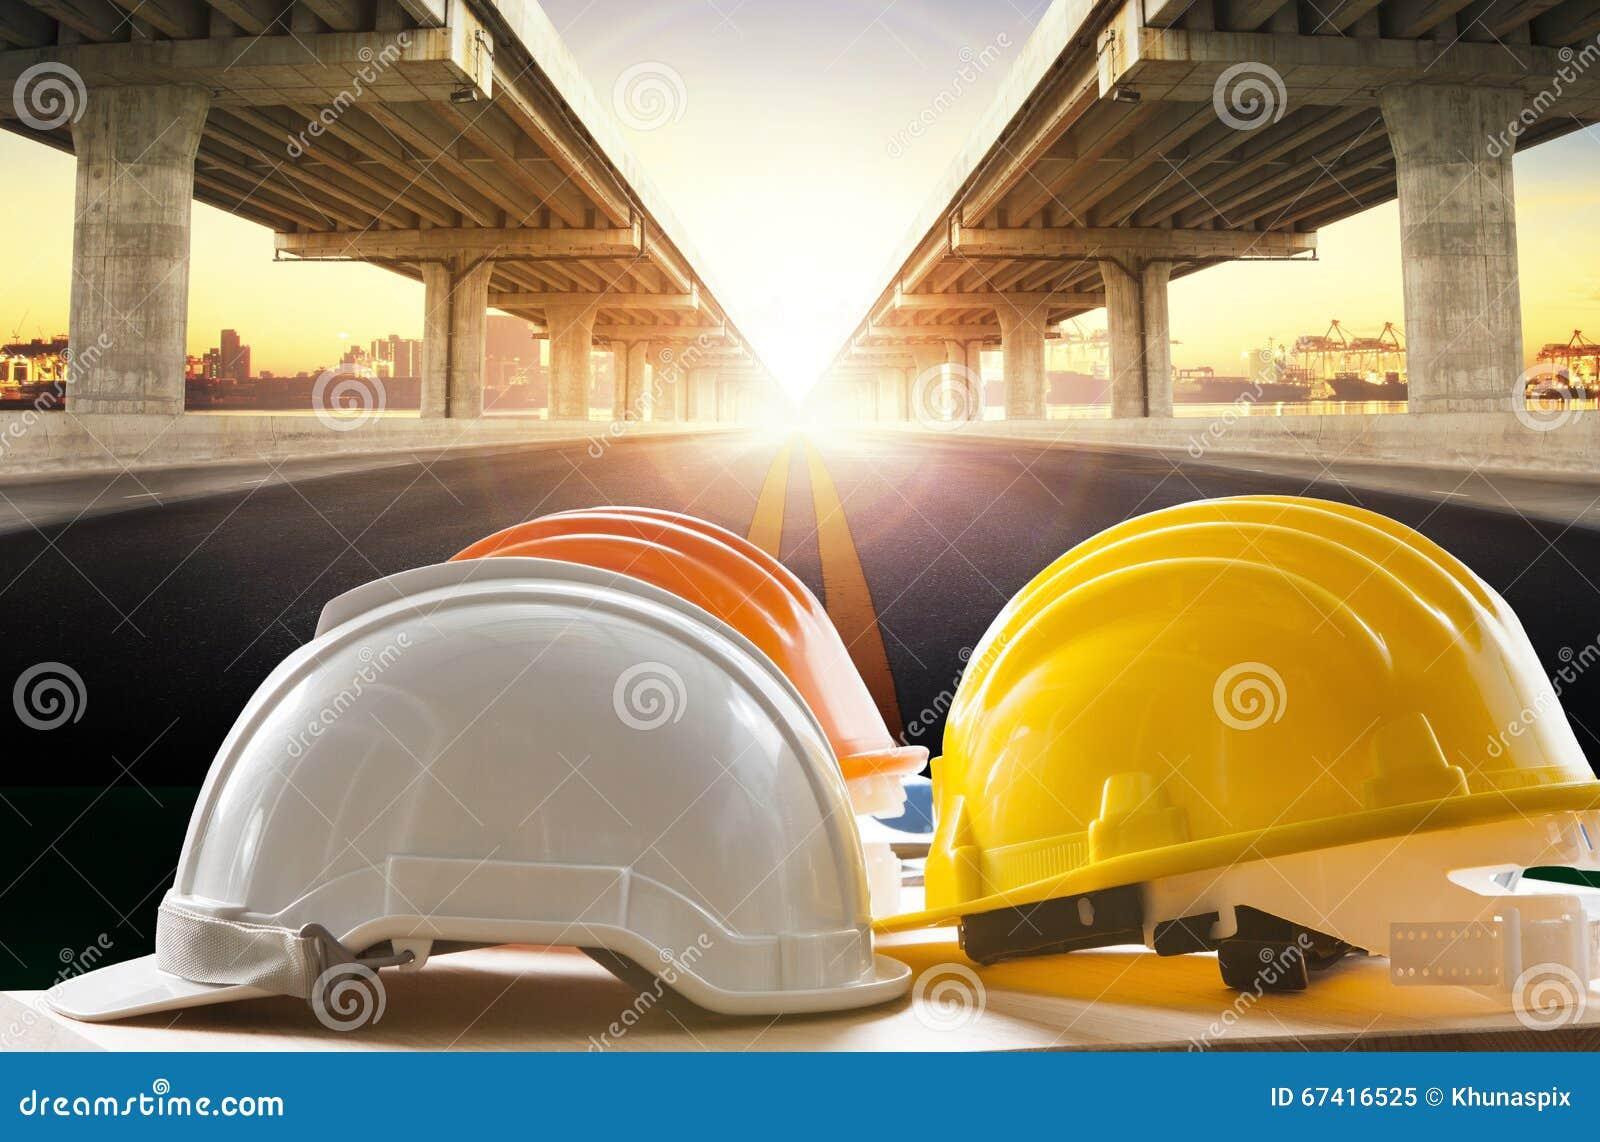 Safety helmet on civil engineering working table against bridge